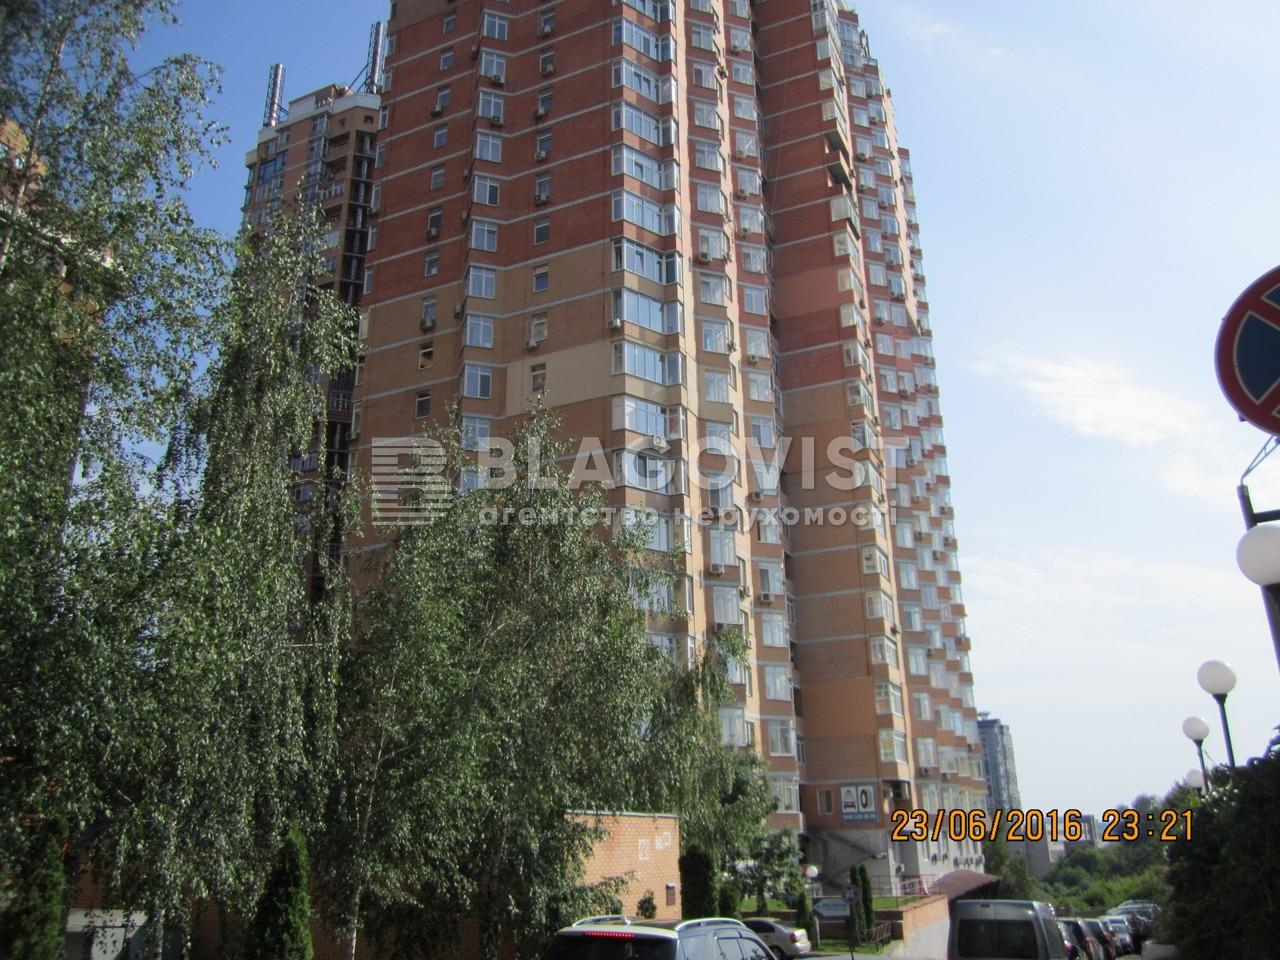 Квартира C-107860, Коновальця Євгена (Щорса), 32г, Київ - Фото 2